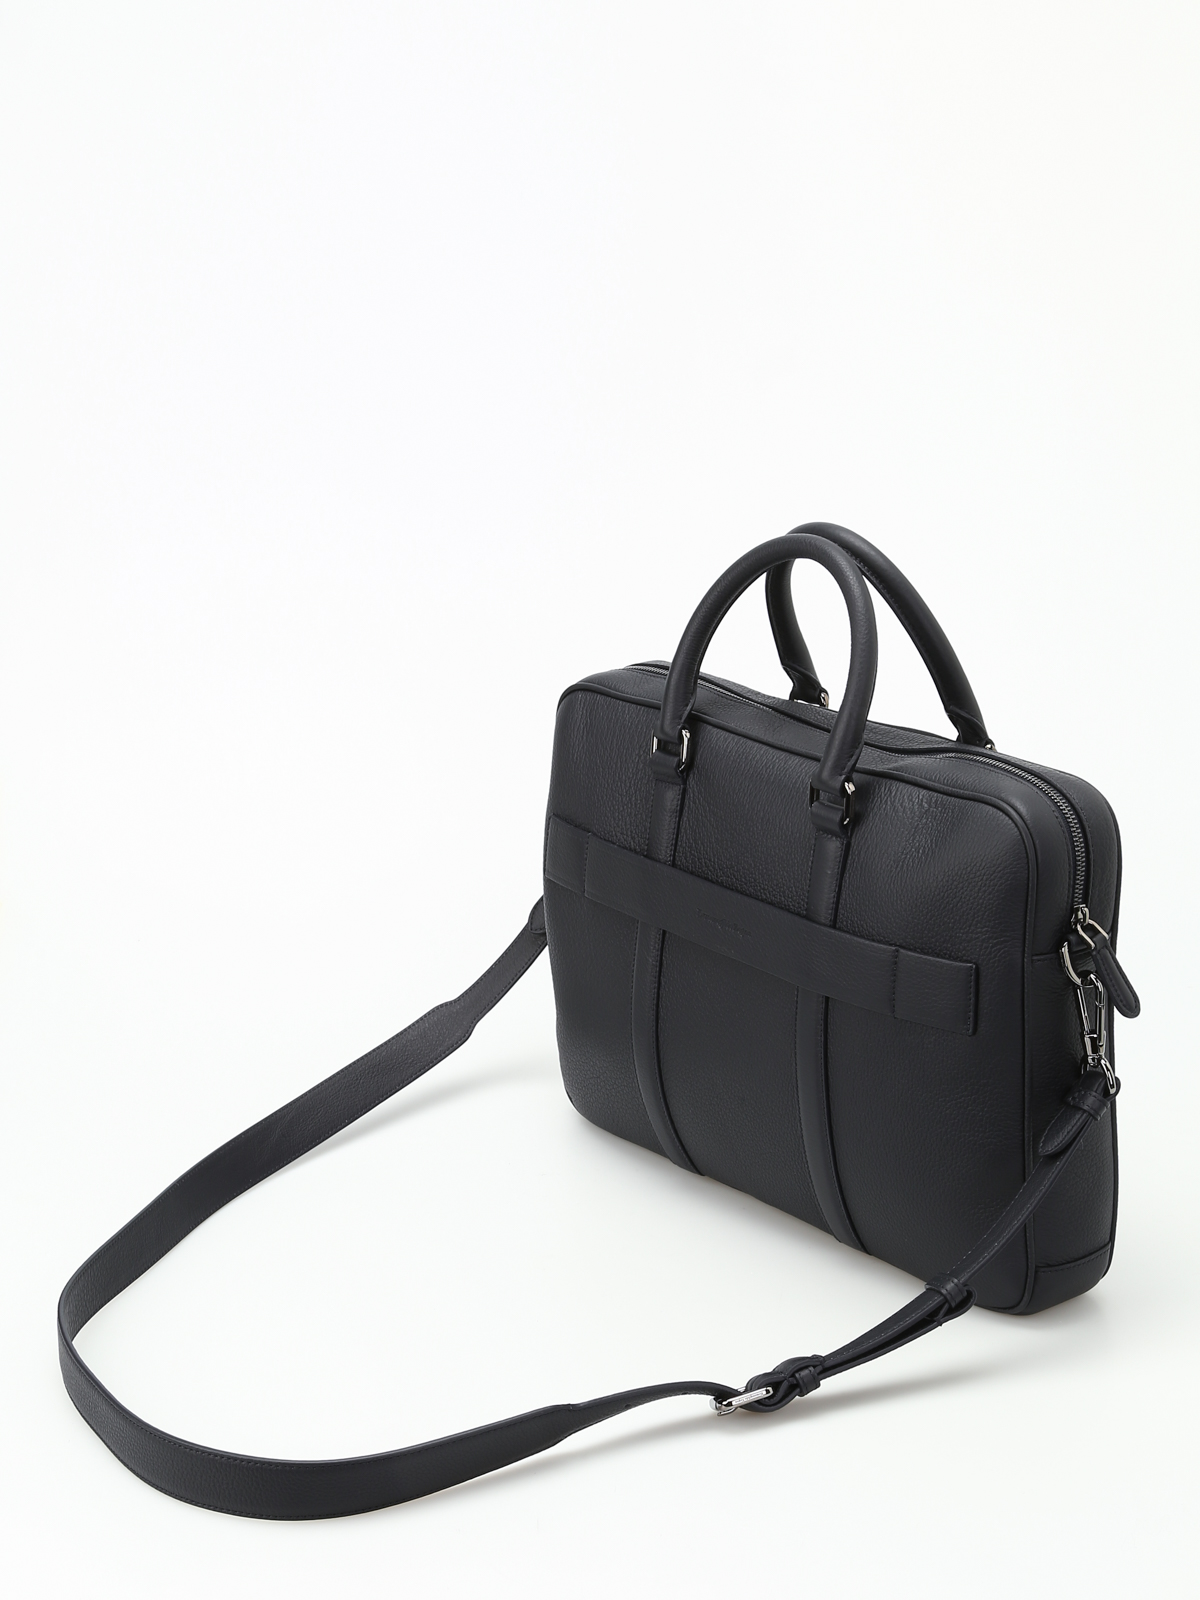 d4f205a2 Ermenegildo Zegna - Dark blue leather briefcase - laptop bags ...